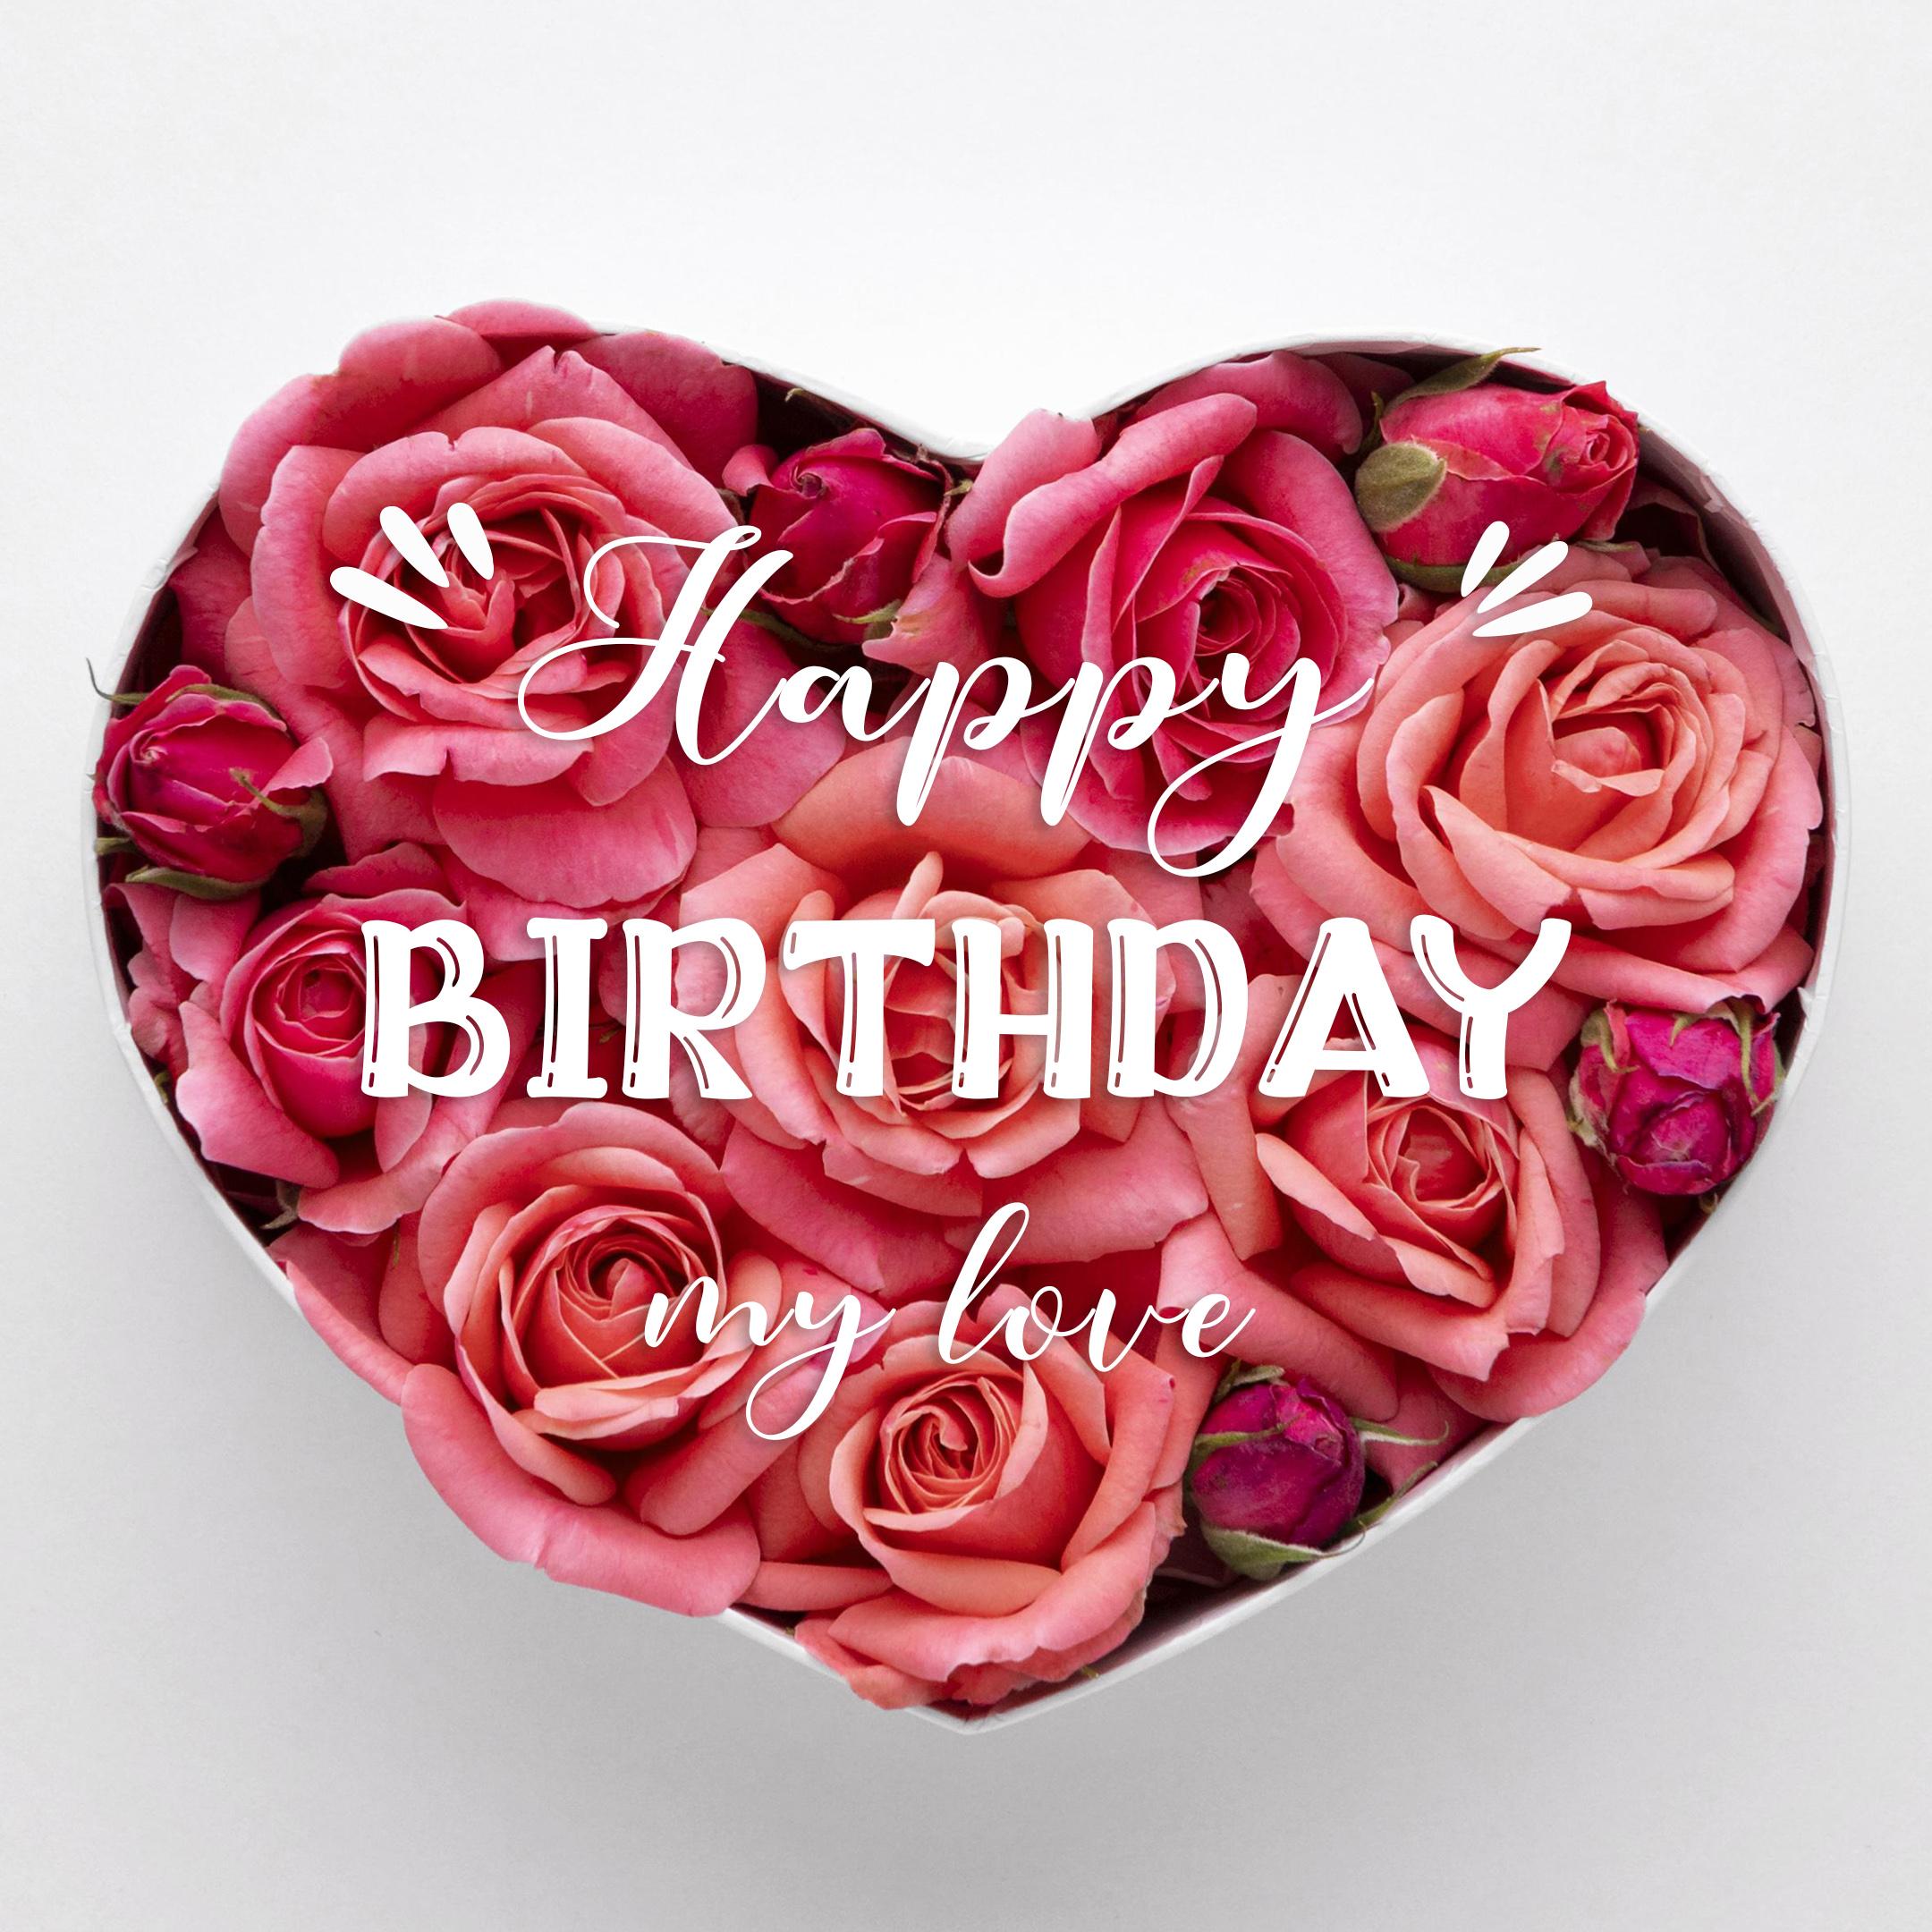 Free Happy Birthday Images With Love - birthdayimg.com